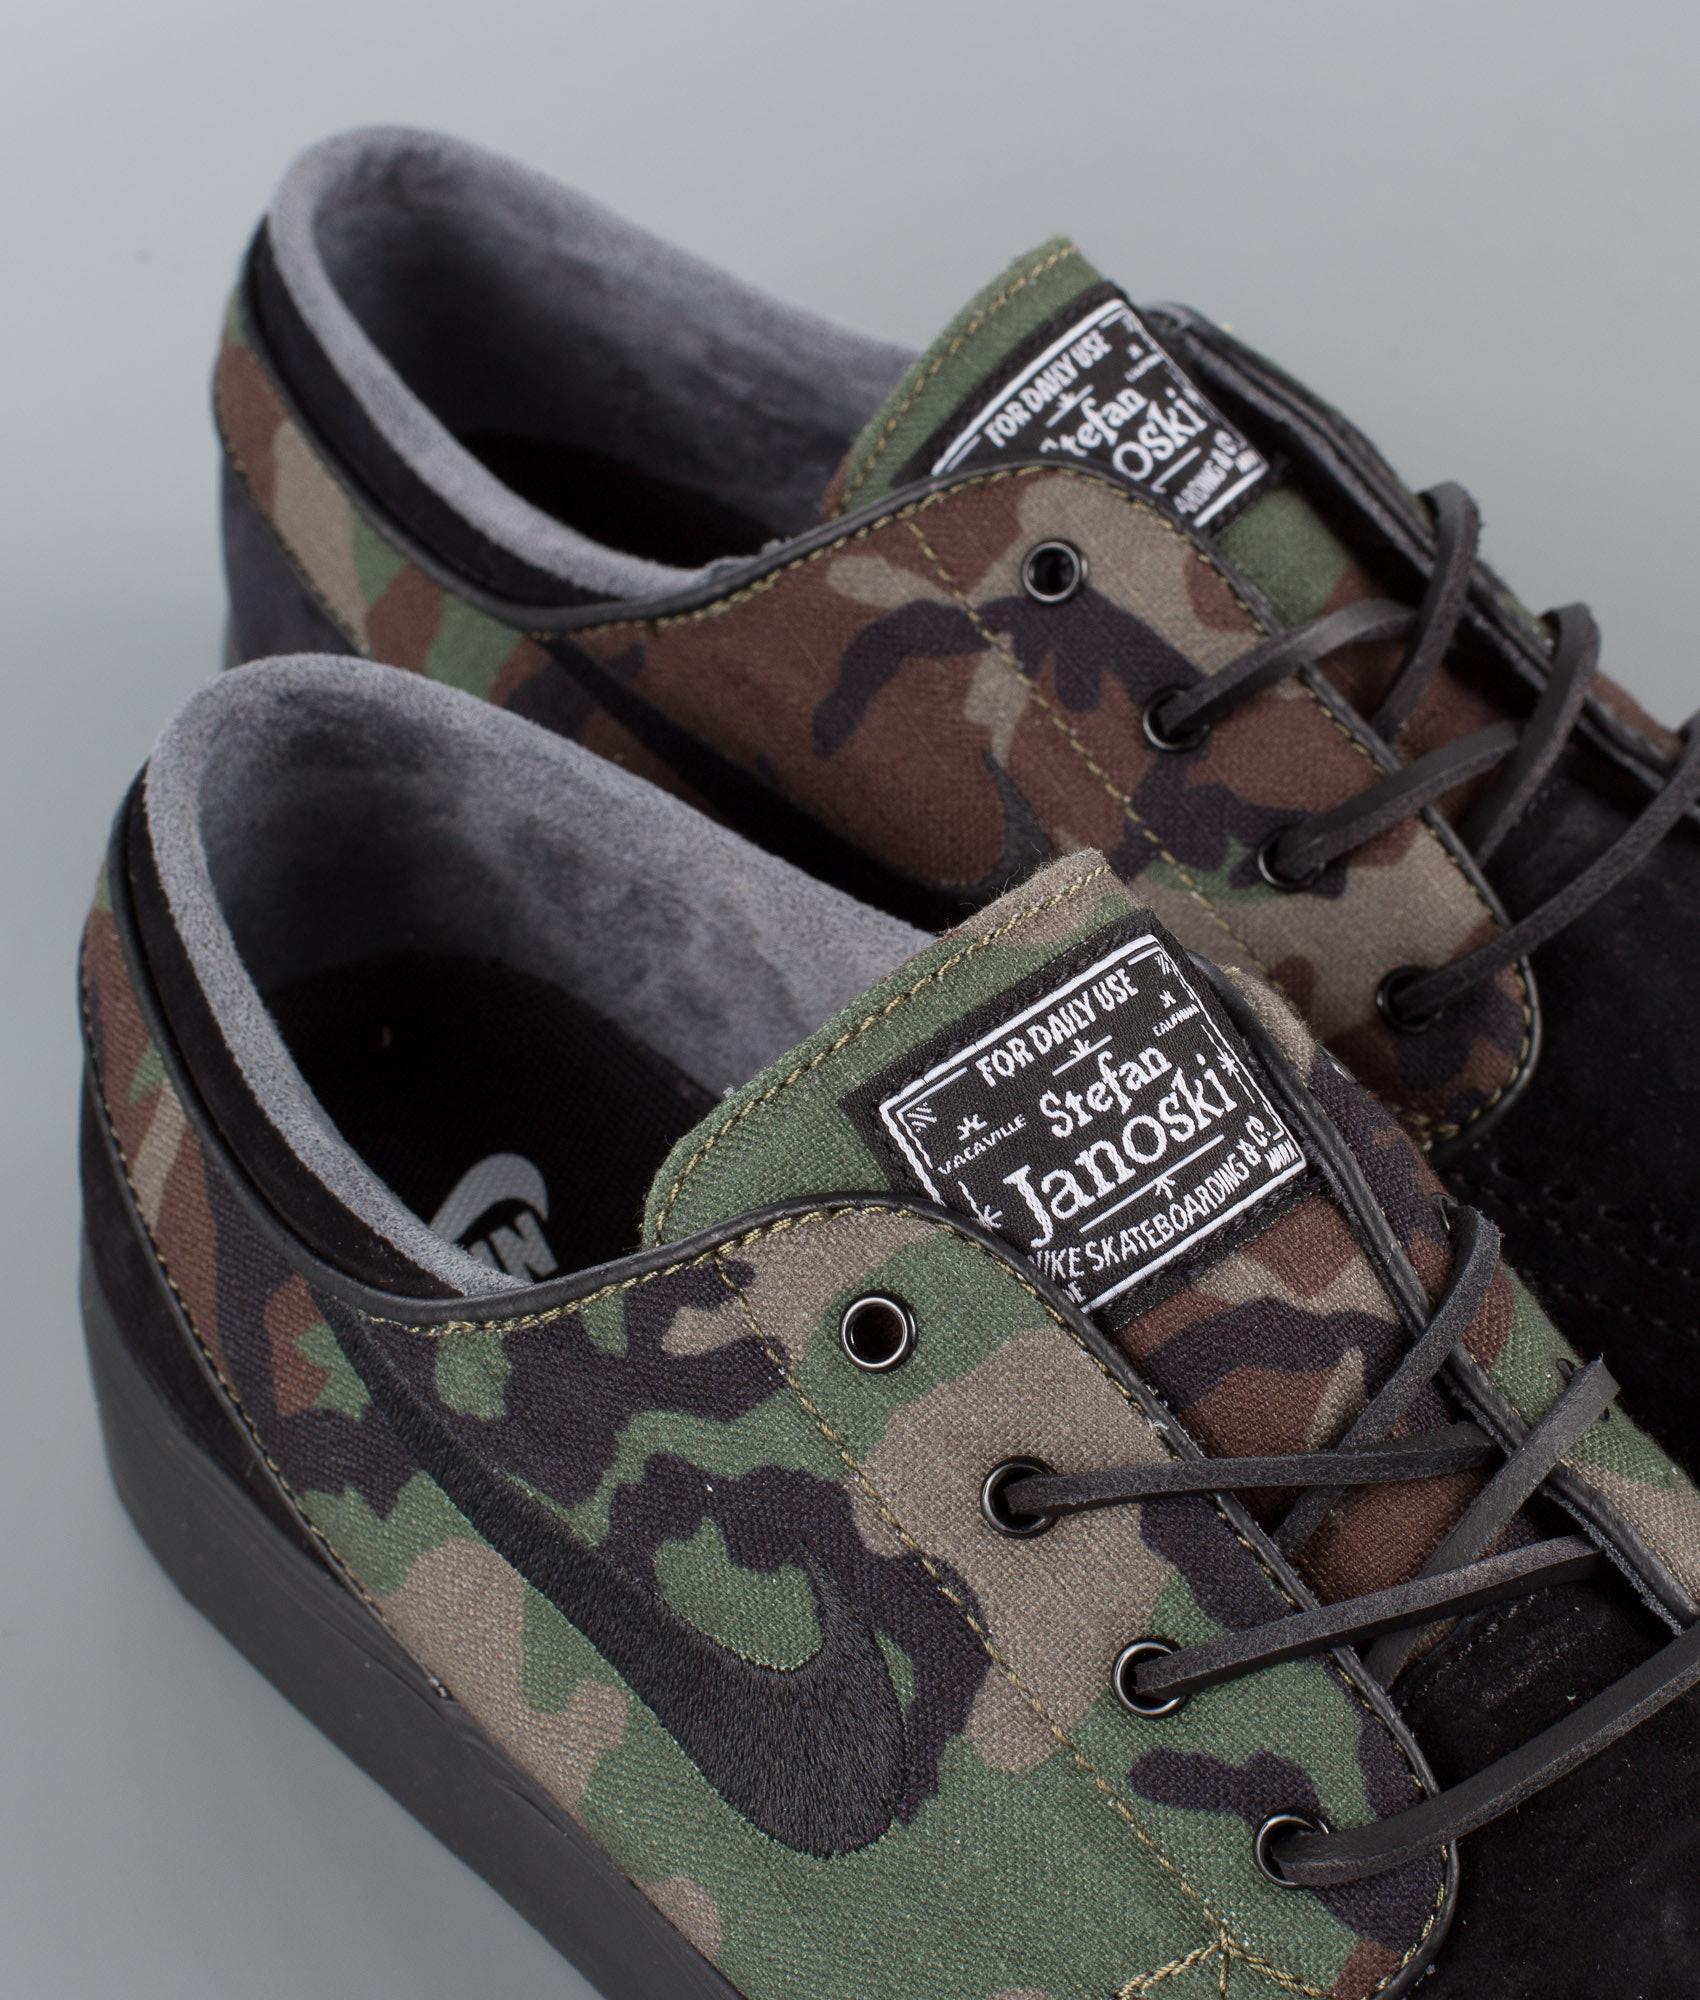 2cce48a295f62 Nike Zoom Stefan Janoski OG Shoes Black Black-Medium Olive-White ...